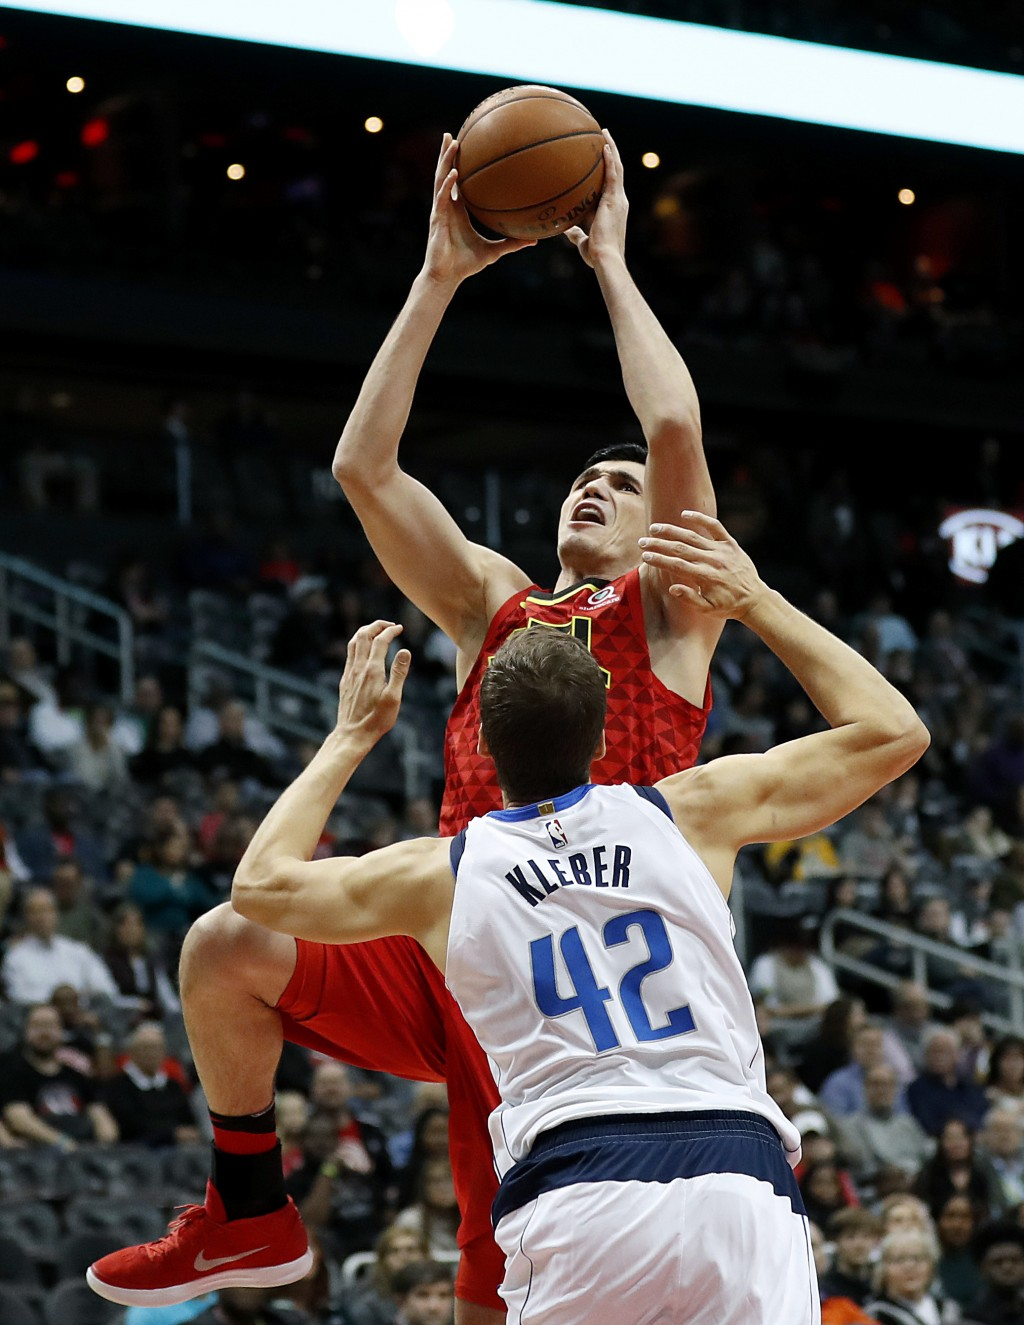 Atlanta Hawks' Ersan Ilyasova, top, of Turkey, shoots against Dallas Mavericks' Maximilian Kleber, of Germany, in the first quarter of an NBA basketba...